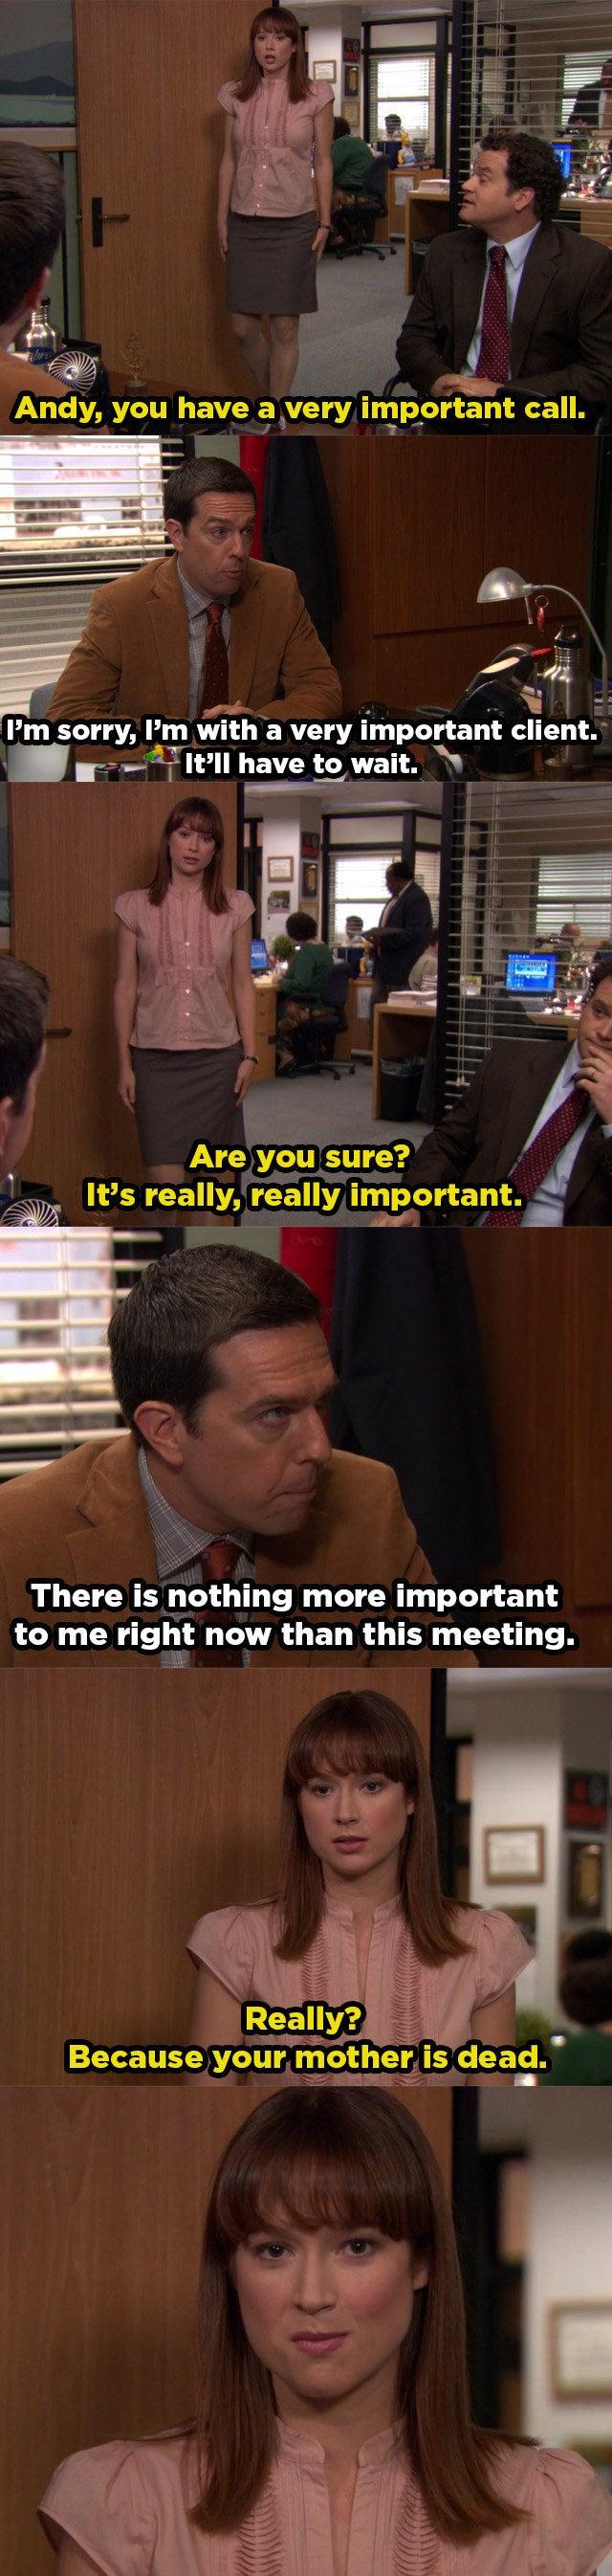 "Episode: Season 8, Episode 7, ""Pam's Replacement"""